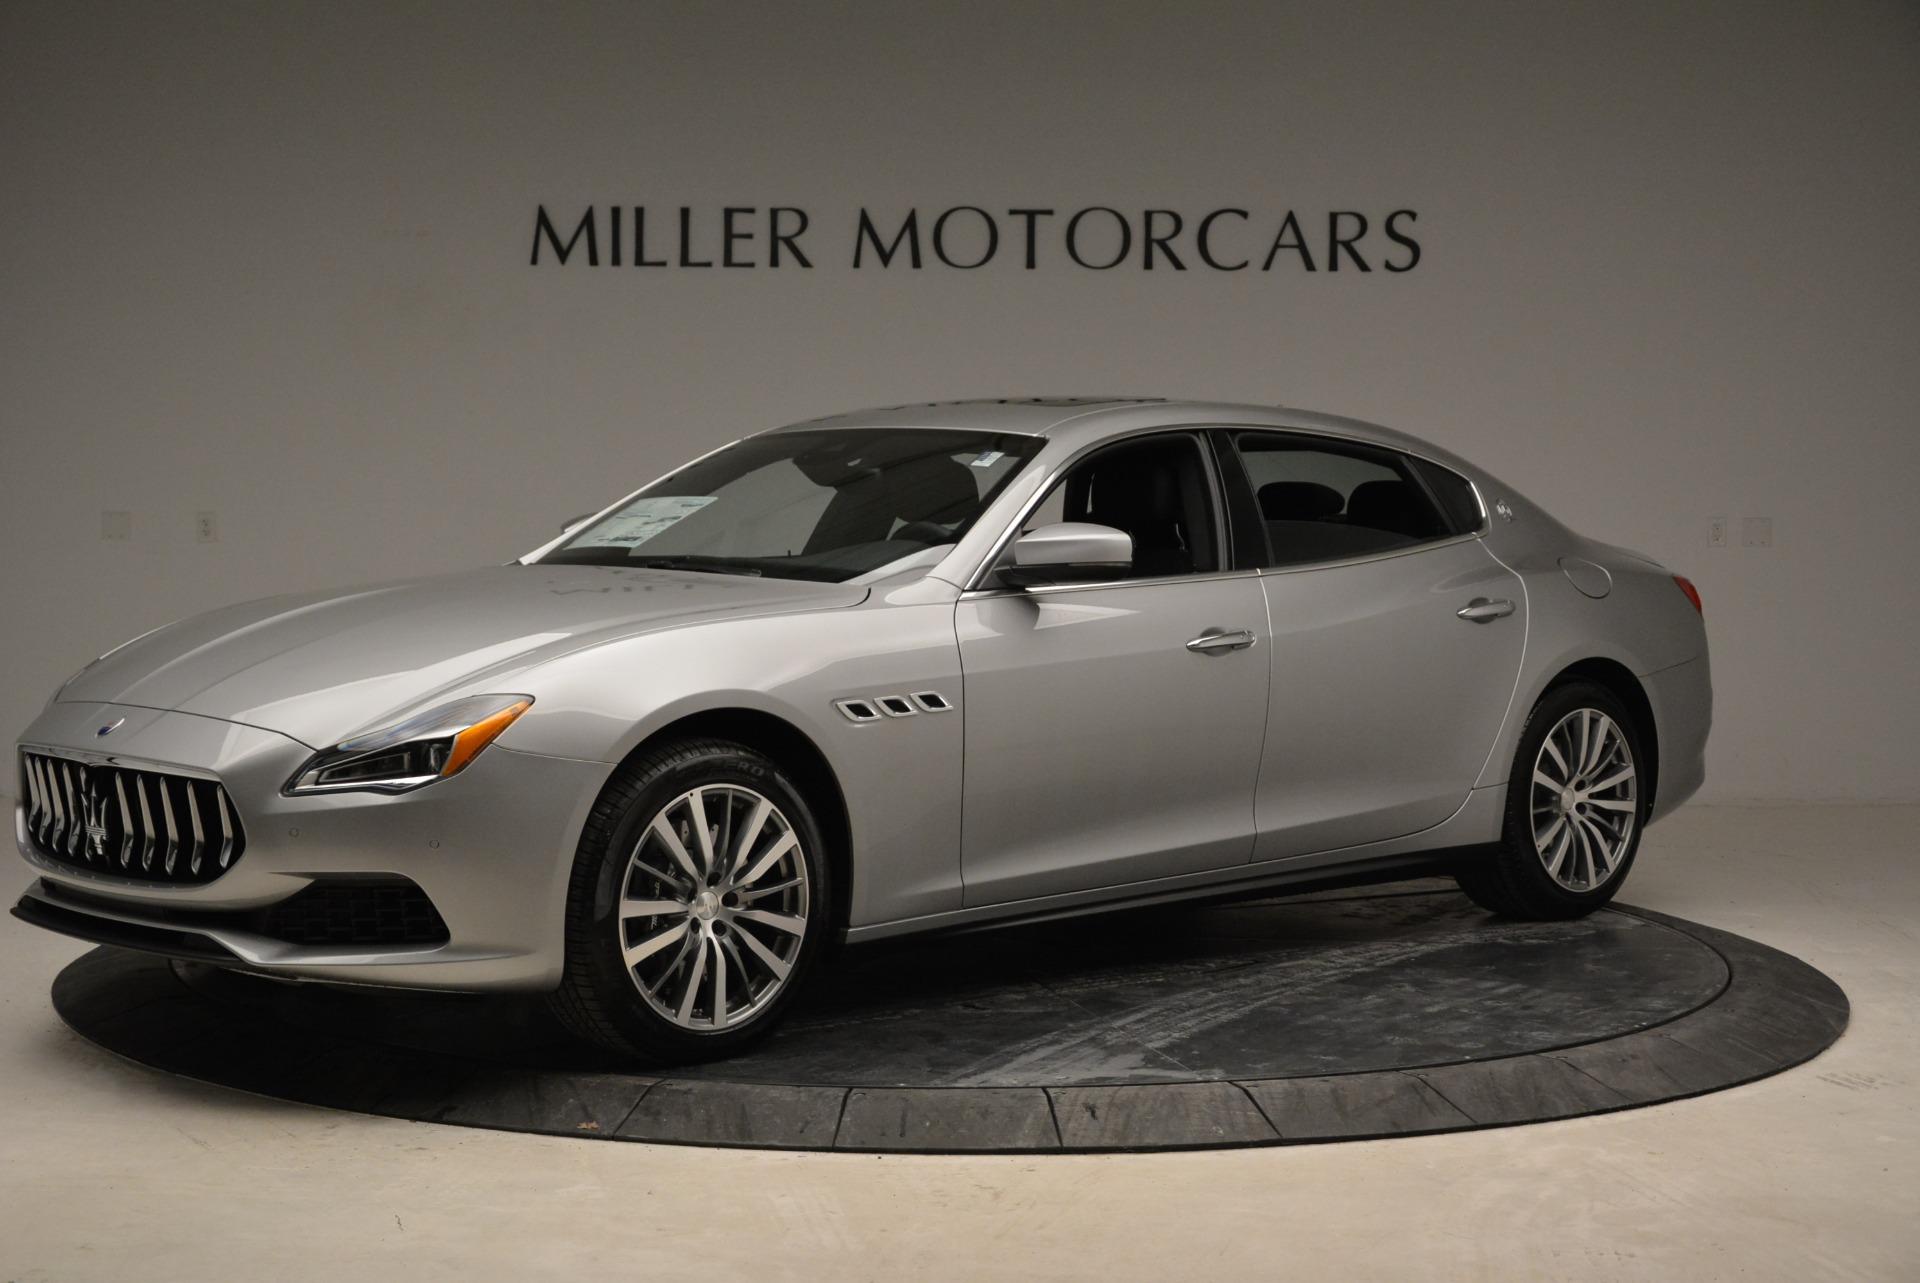 New 2018 Maserati Quattroporte S Q4 For Sale () | Miller Motorcars Stock #M1980